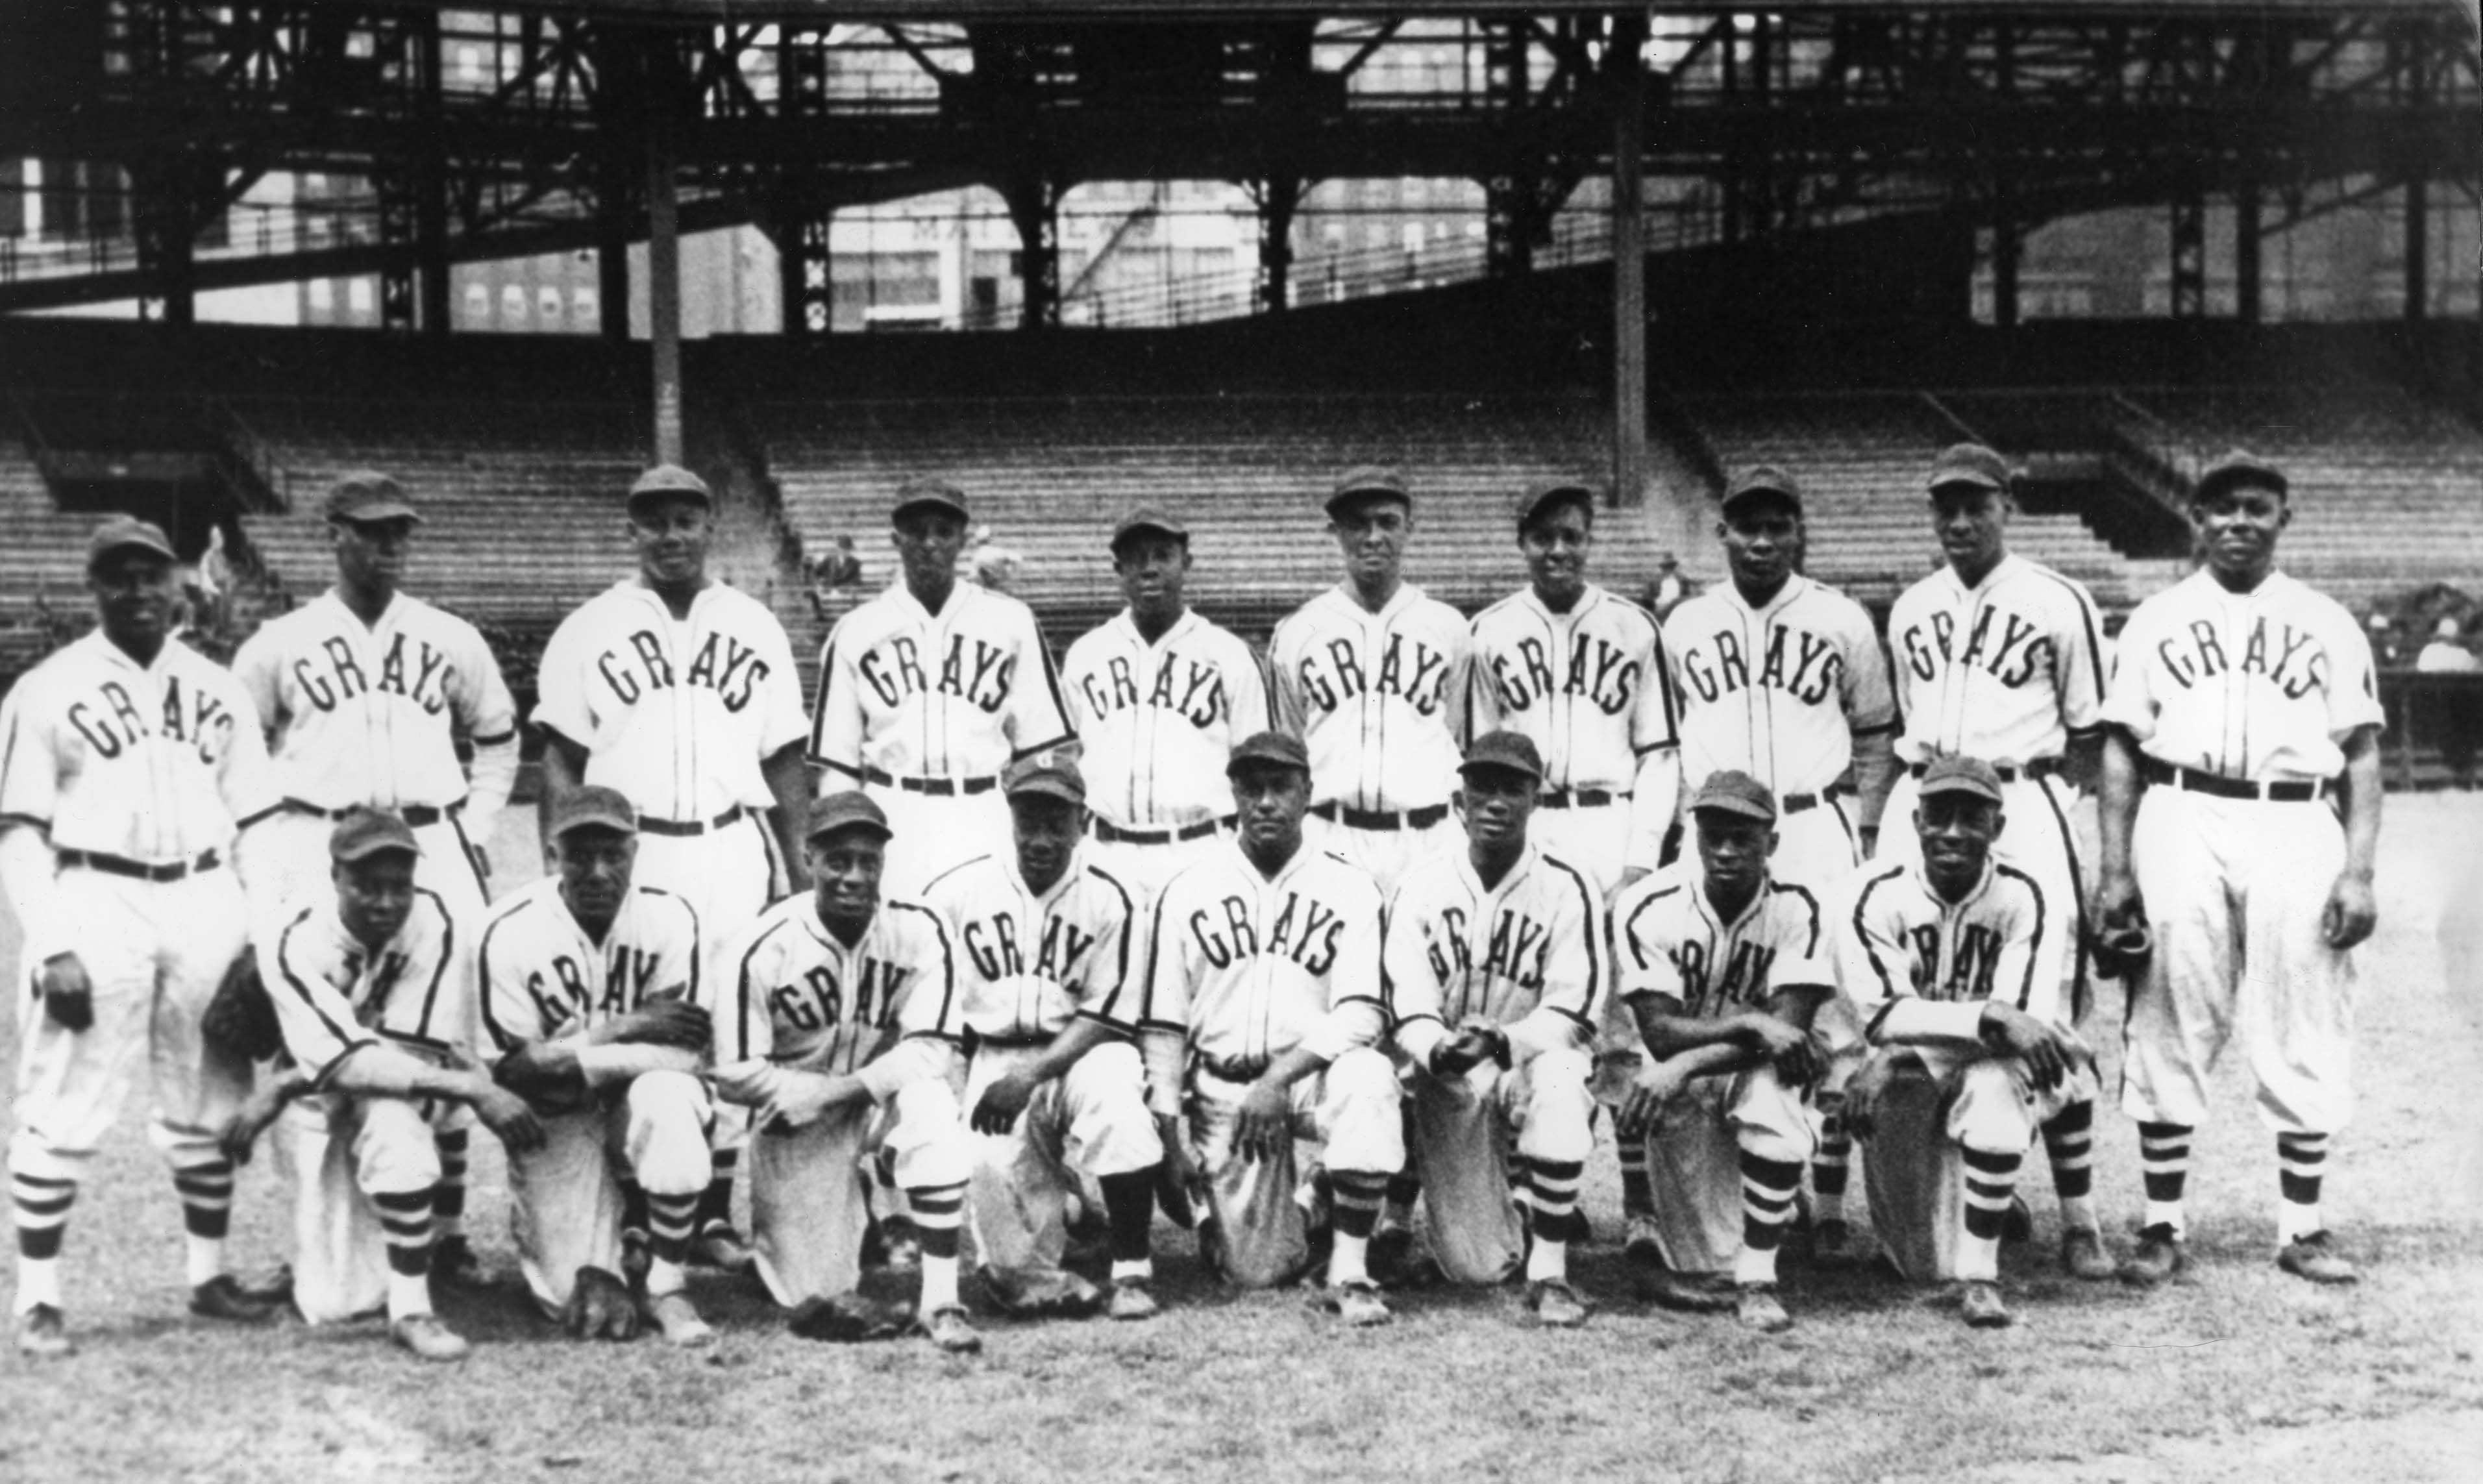 4e22401b091 The history of black baseball in D.C. includes Frederick Douglass ...